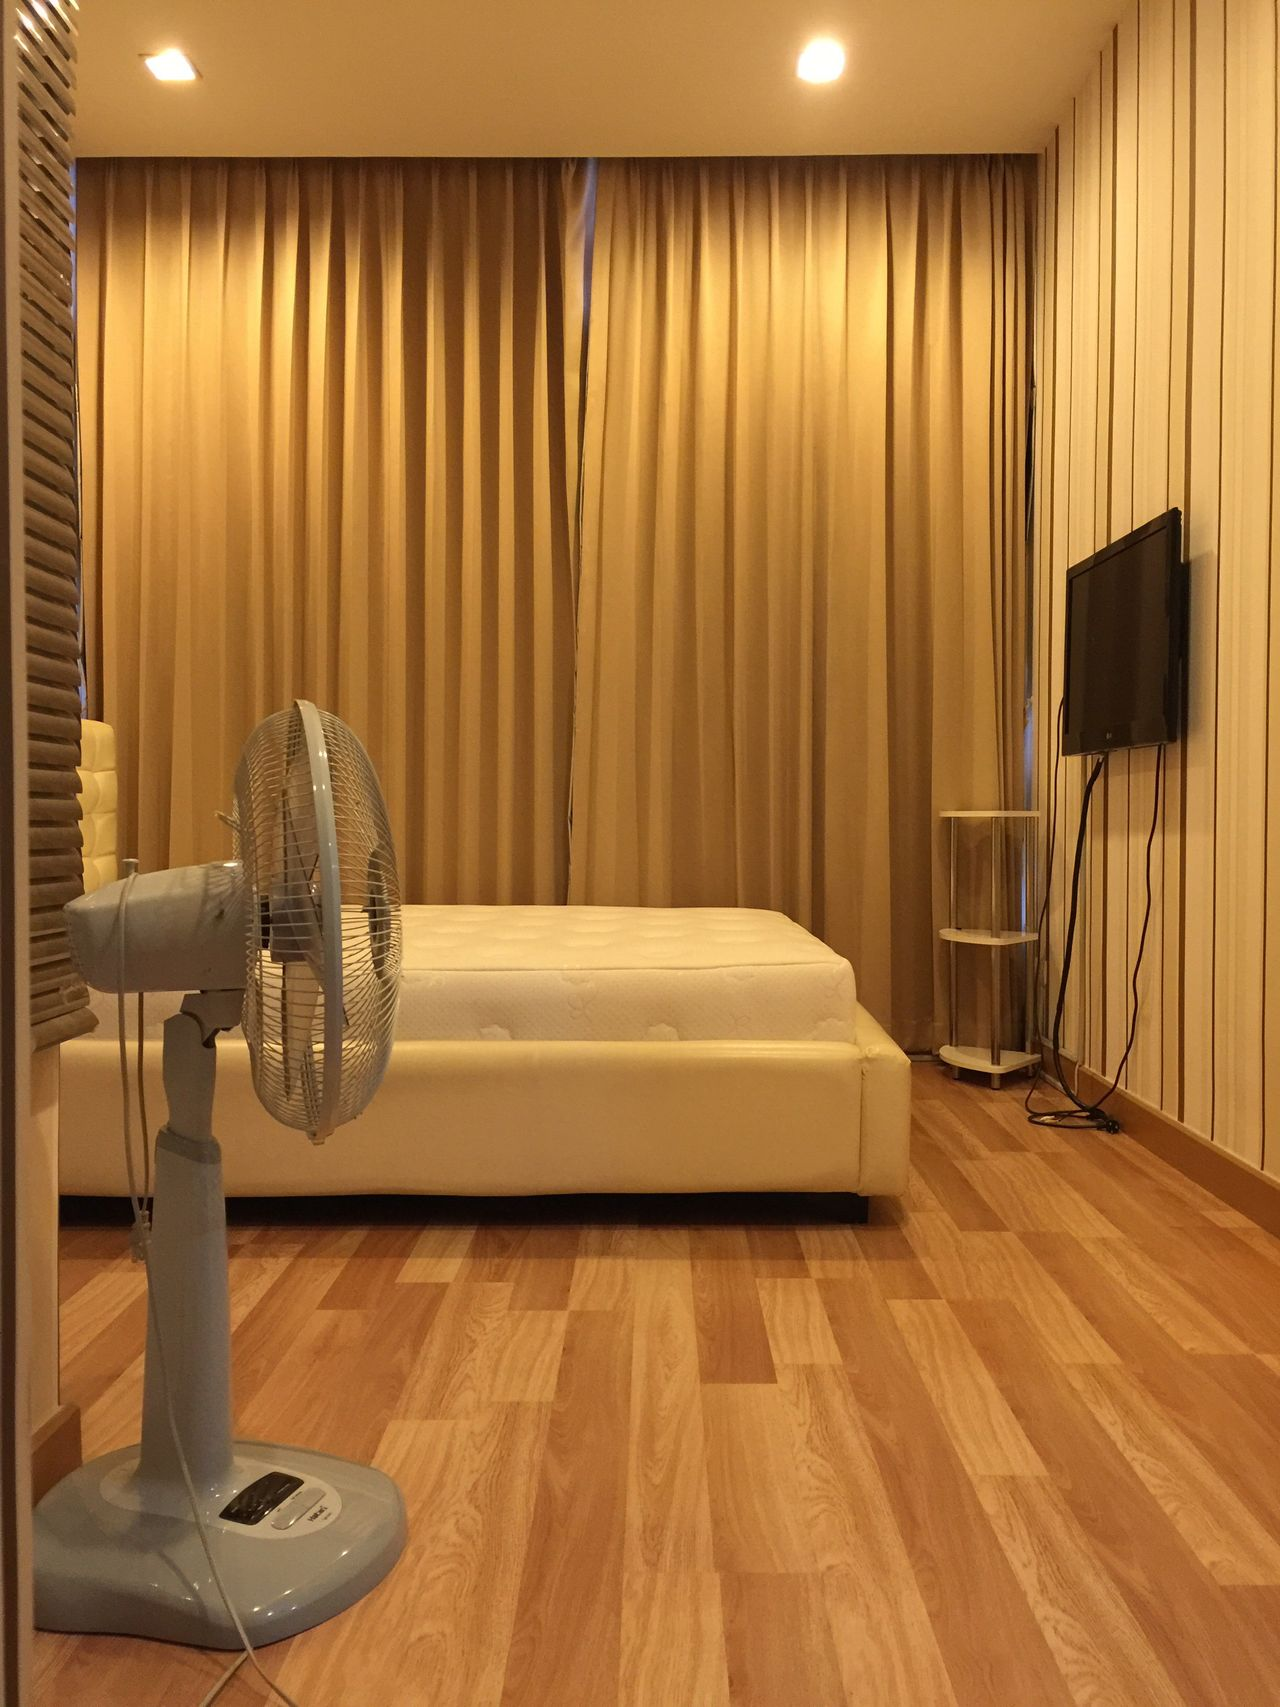 Condominium Bedroom Wide Shot bed Thailand No People, Indoors Modern fan Clean Curtain Walls Wallpaper Modern Design